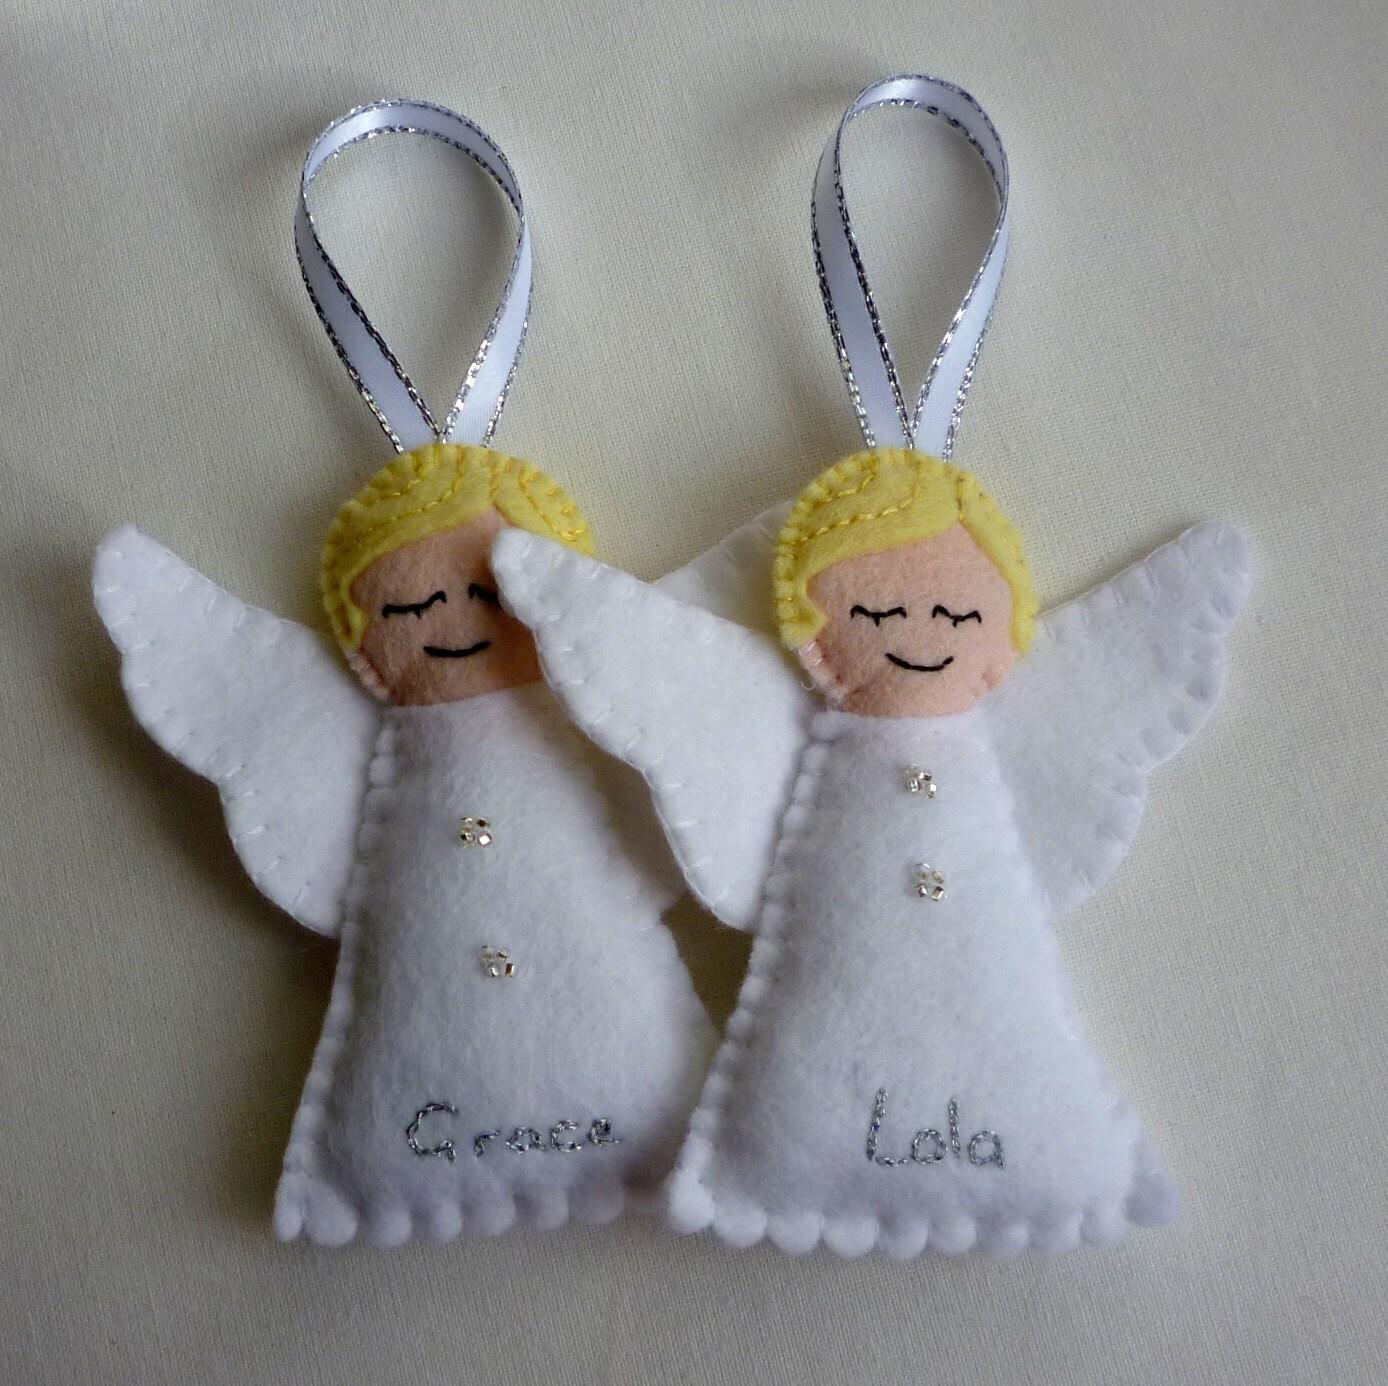 Personalised Felt Angel Handmade Ornament by ...